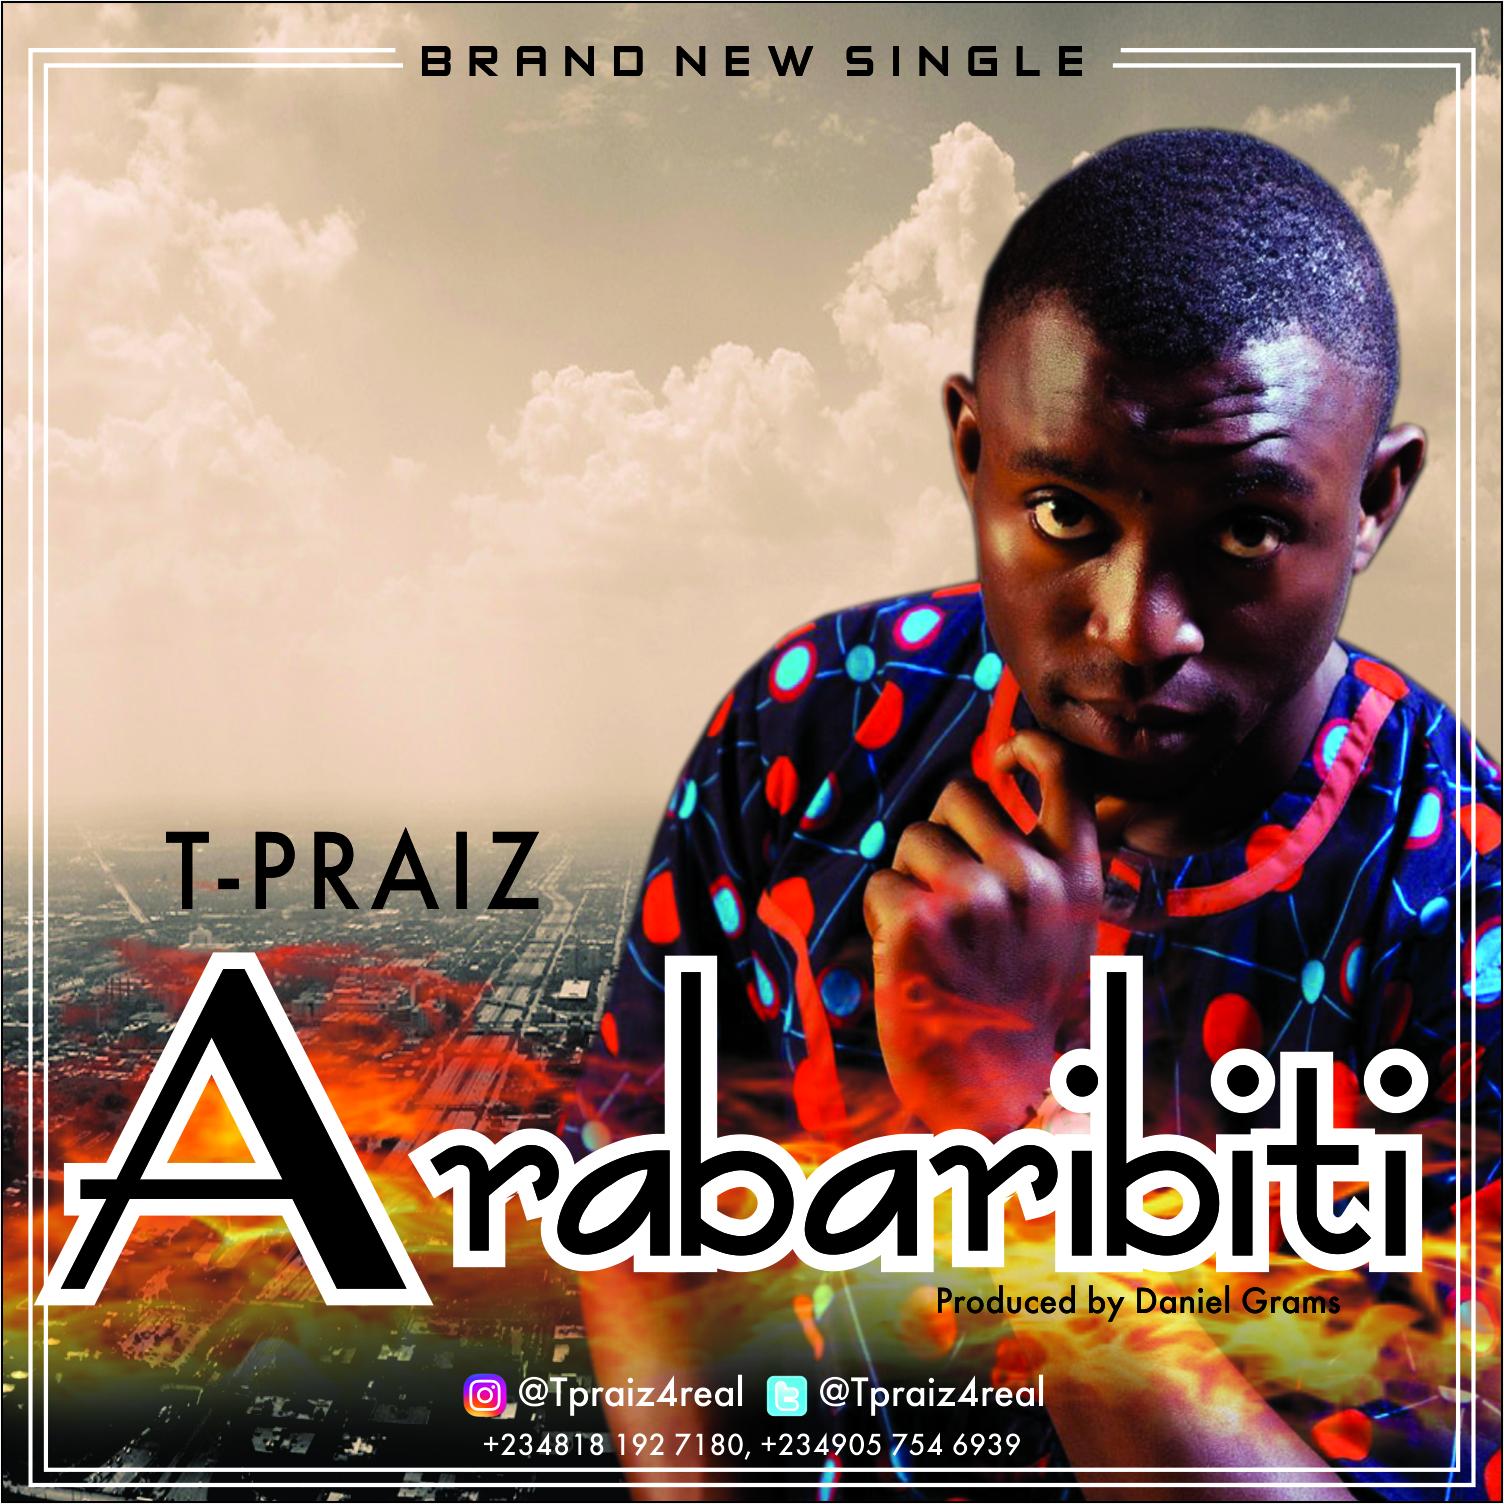 T-Praiz - Arabaribiti